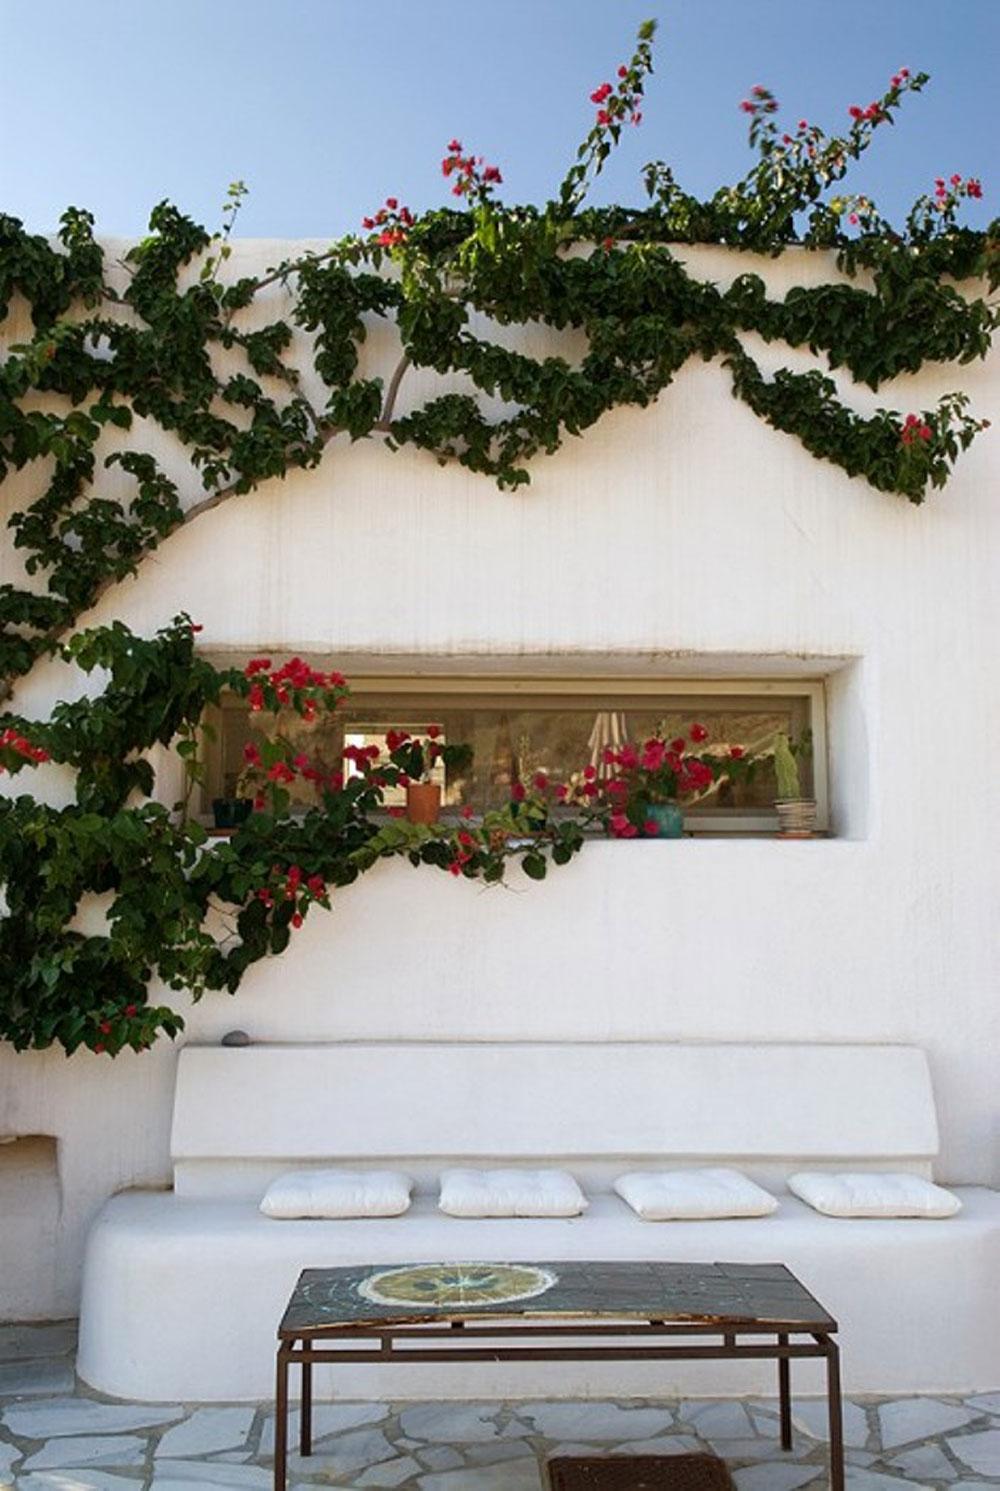 lavender-fragrance-house-project-studio265-15